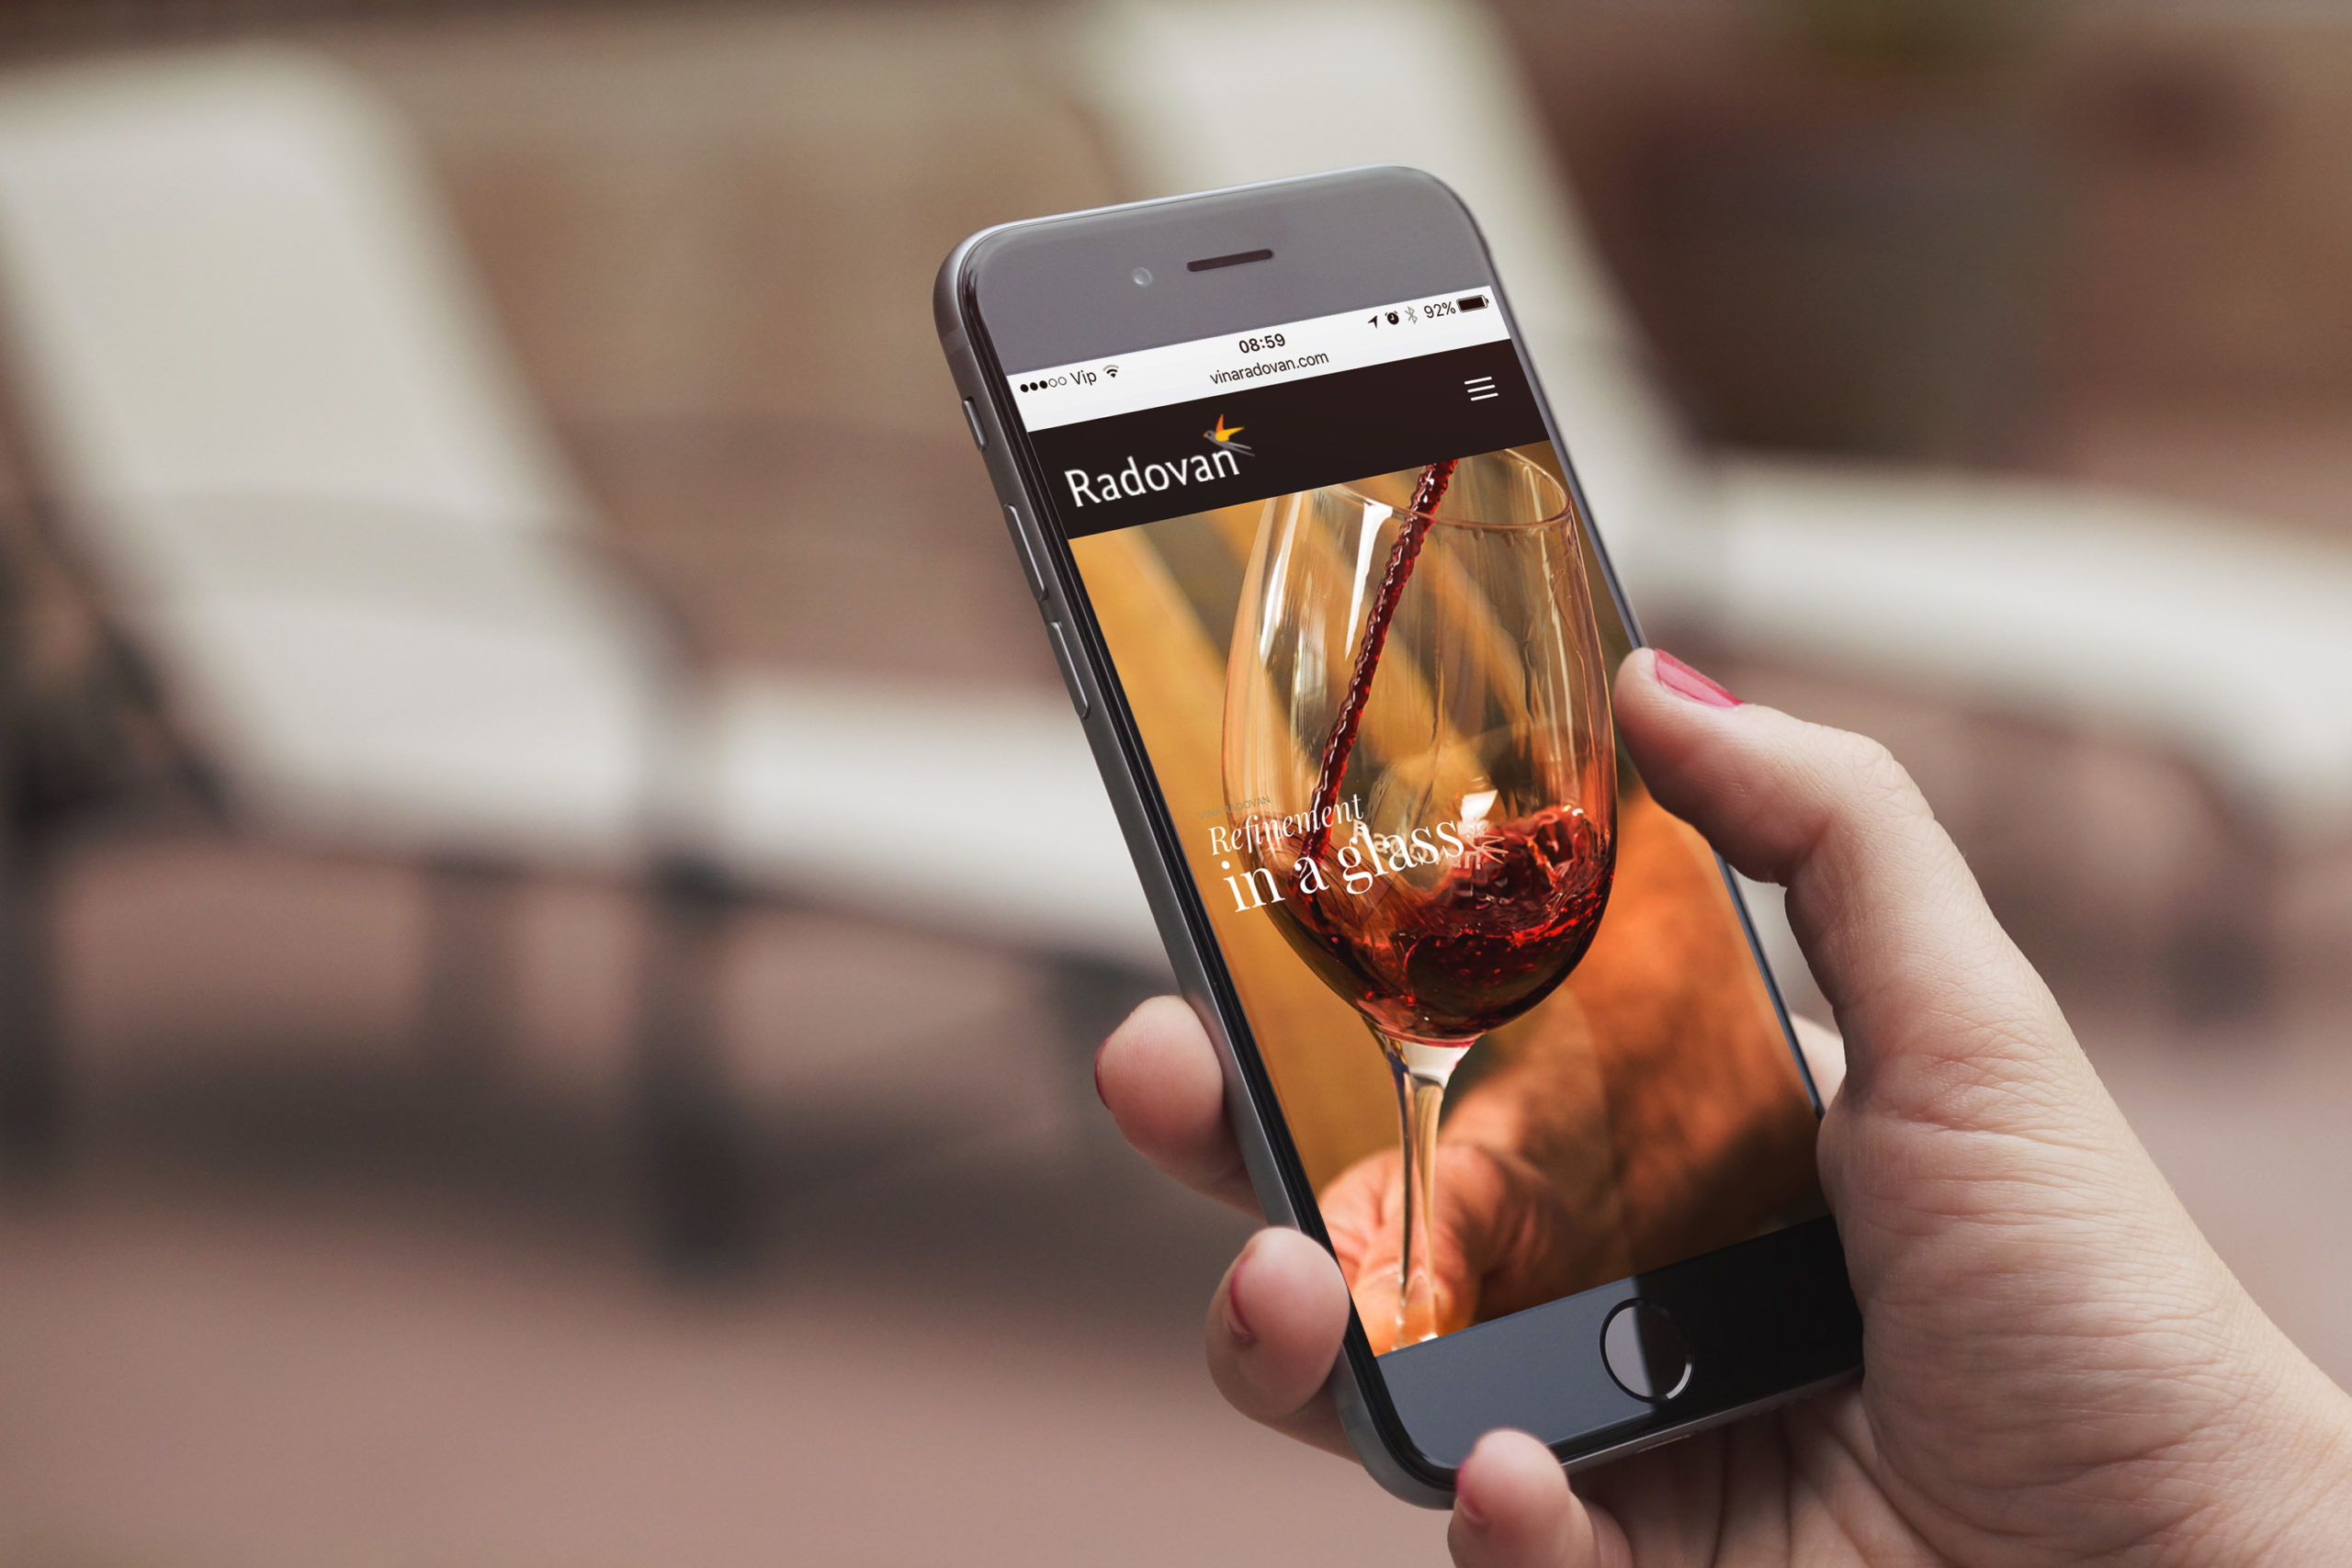 hren | plethora of creativity // Radovan winery digital presence